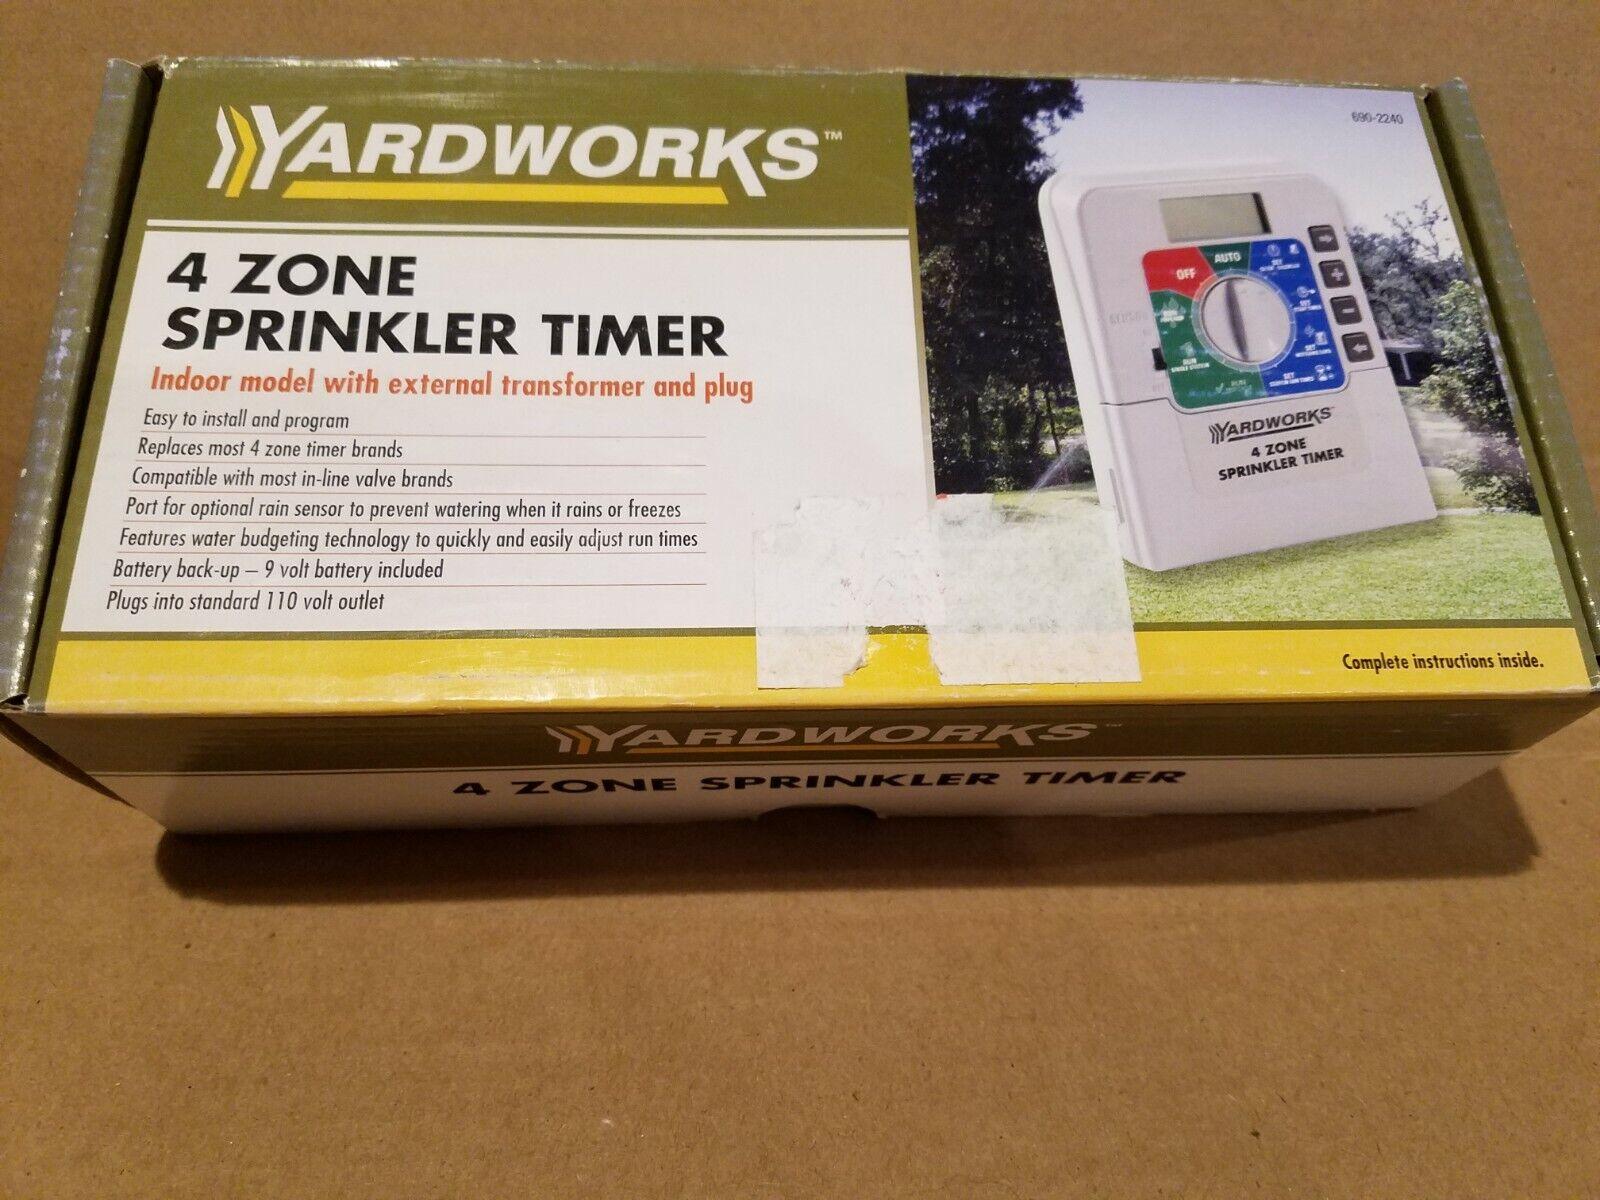 Yardworks 4 zone SPRINKLER TIMER with battery back-up - NEW!